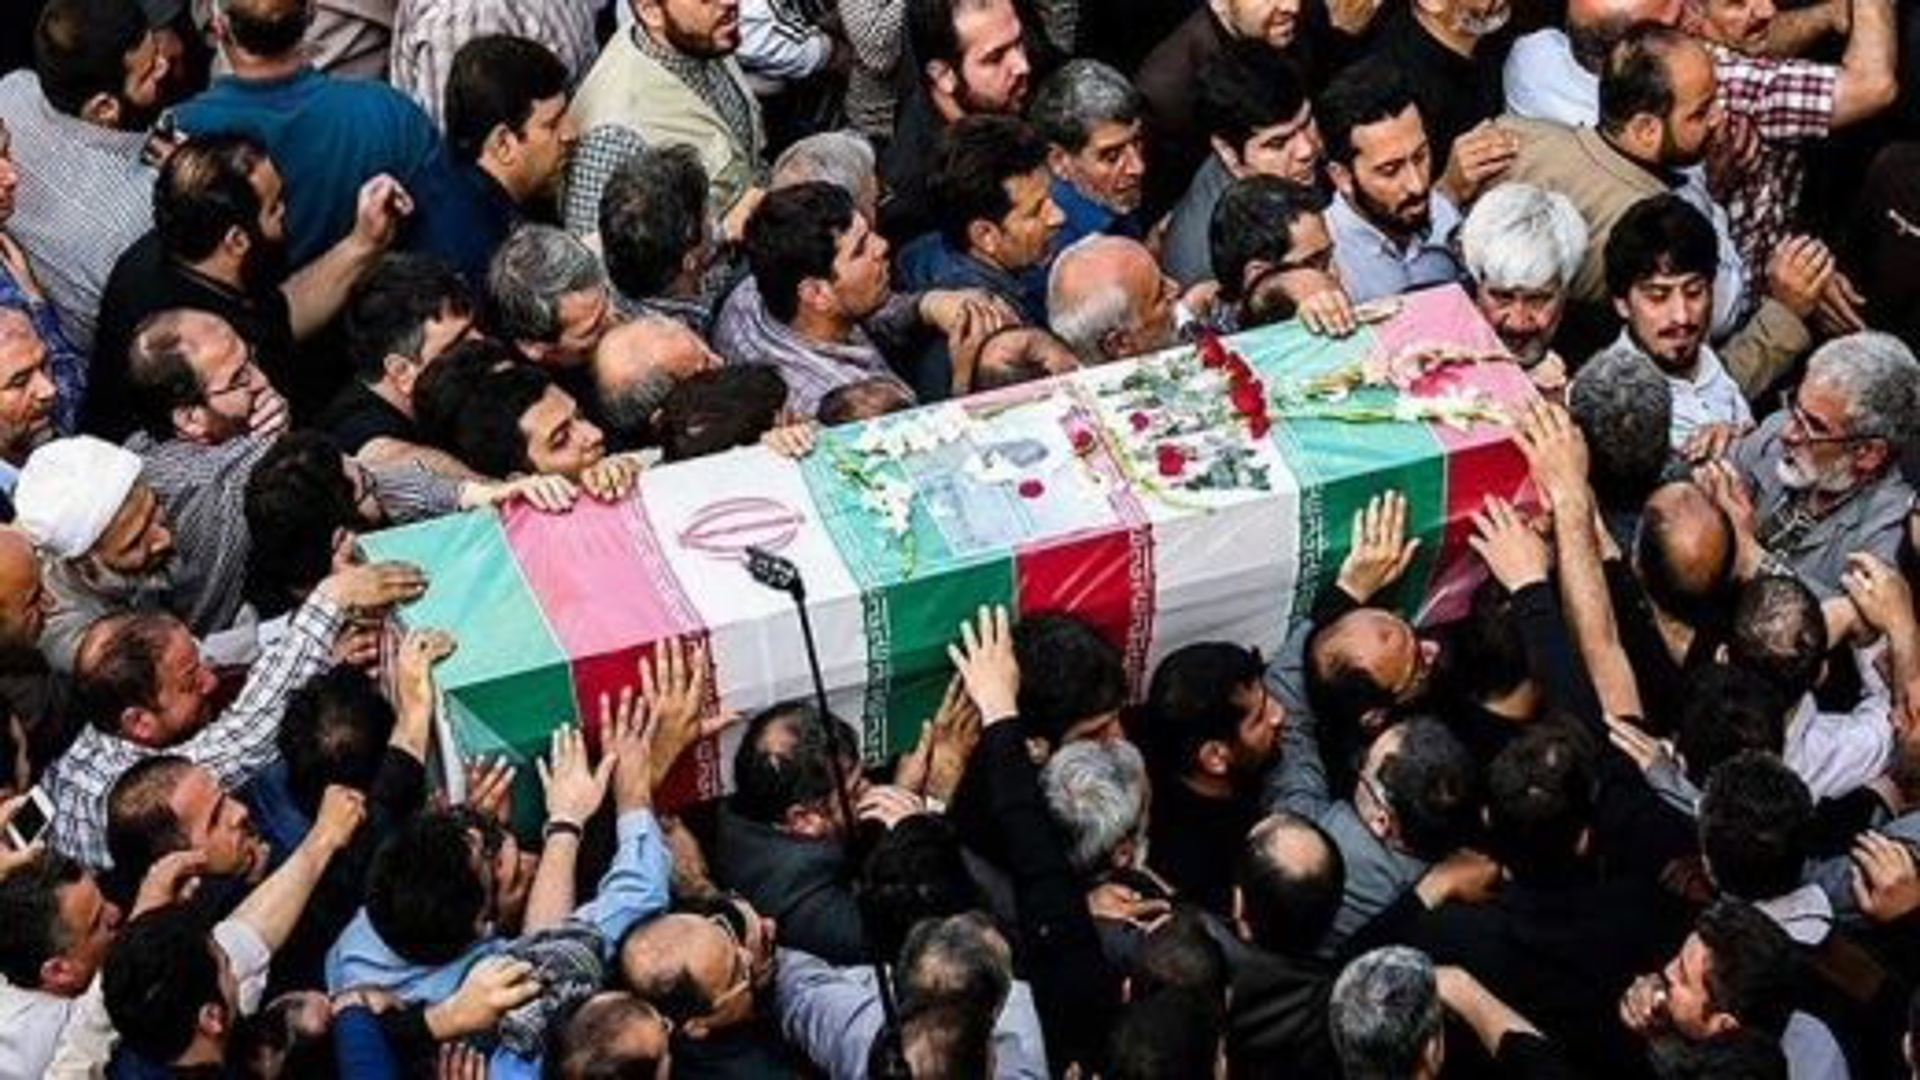 تشییع پیکر شهید حسن جنگجو | تگ